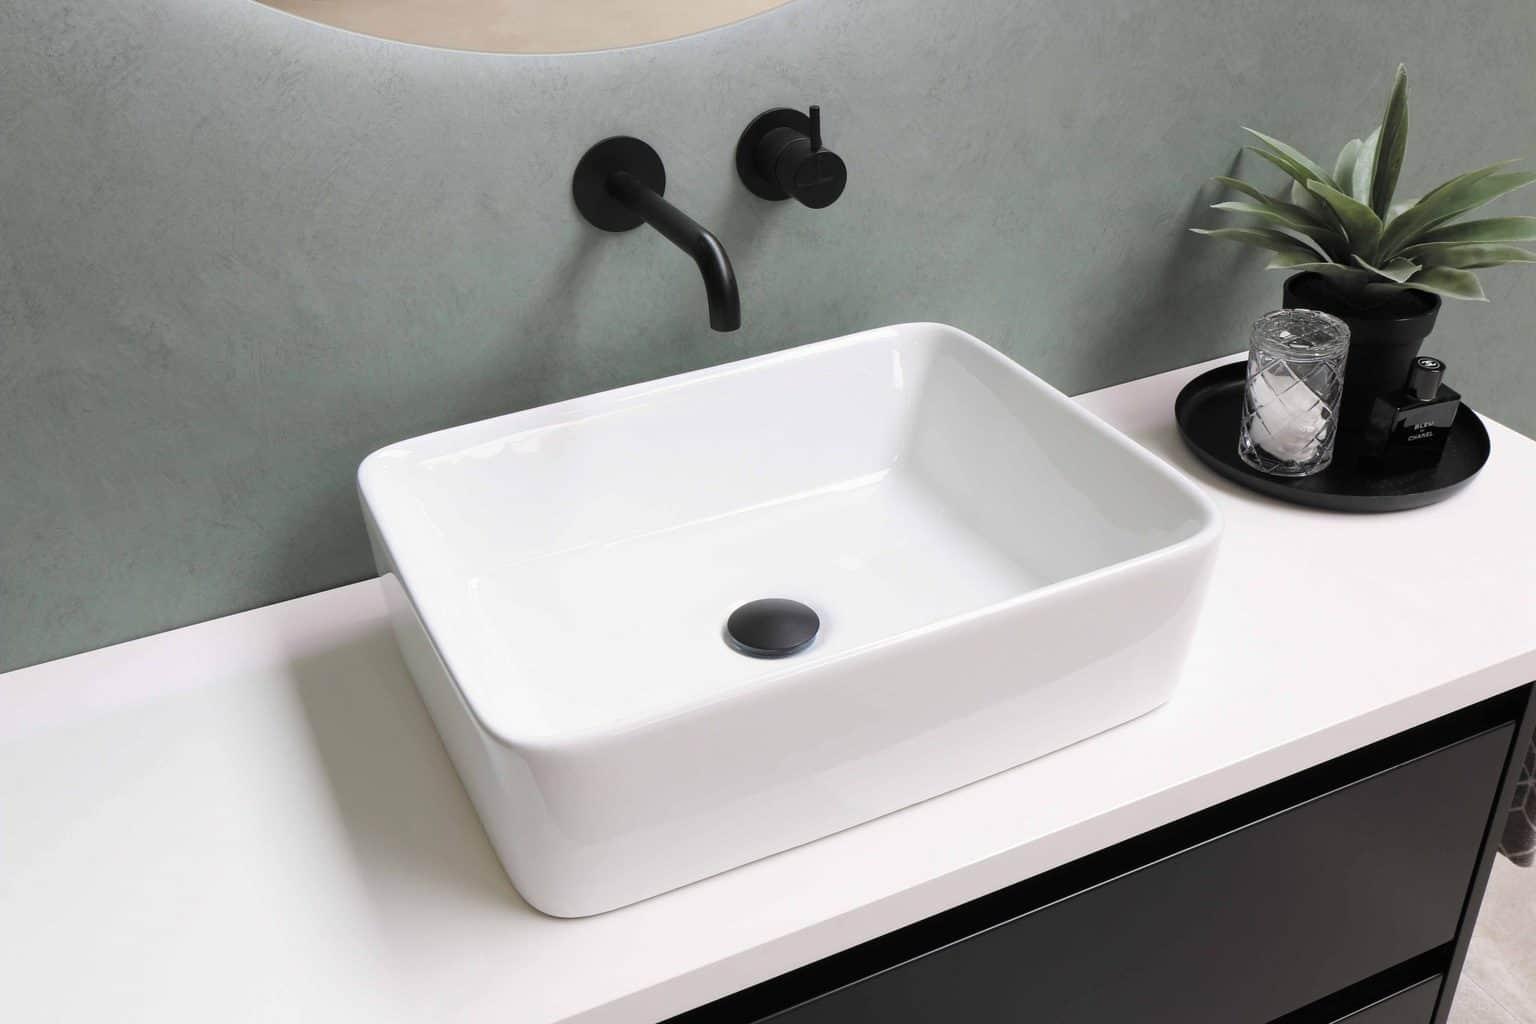 A simple fiberglass sink with black faucet